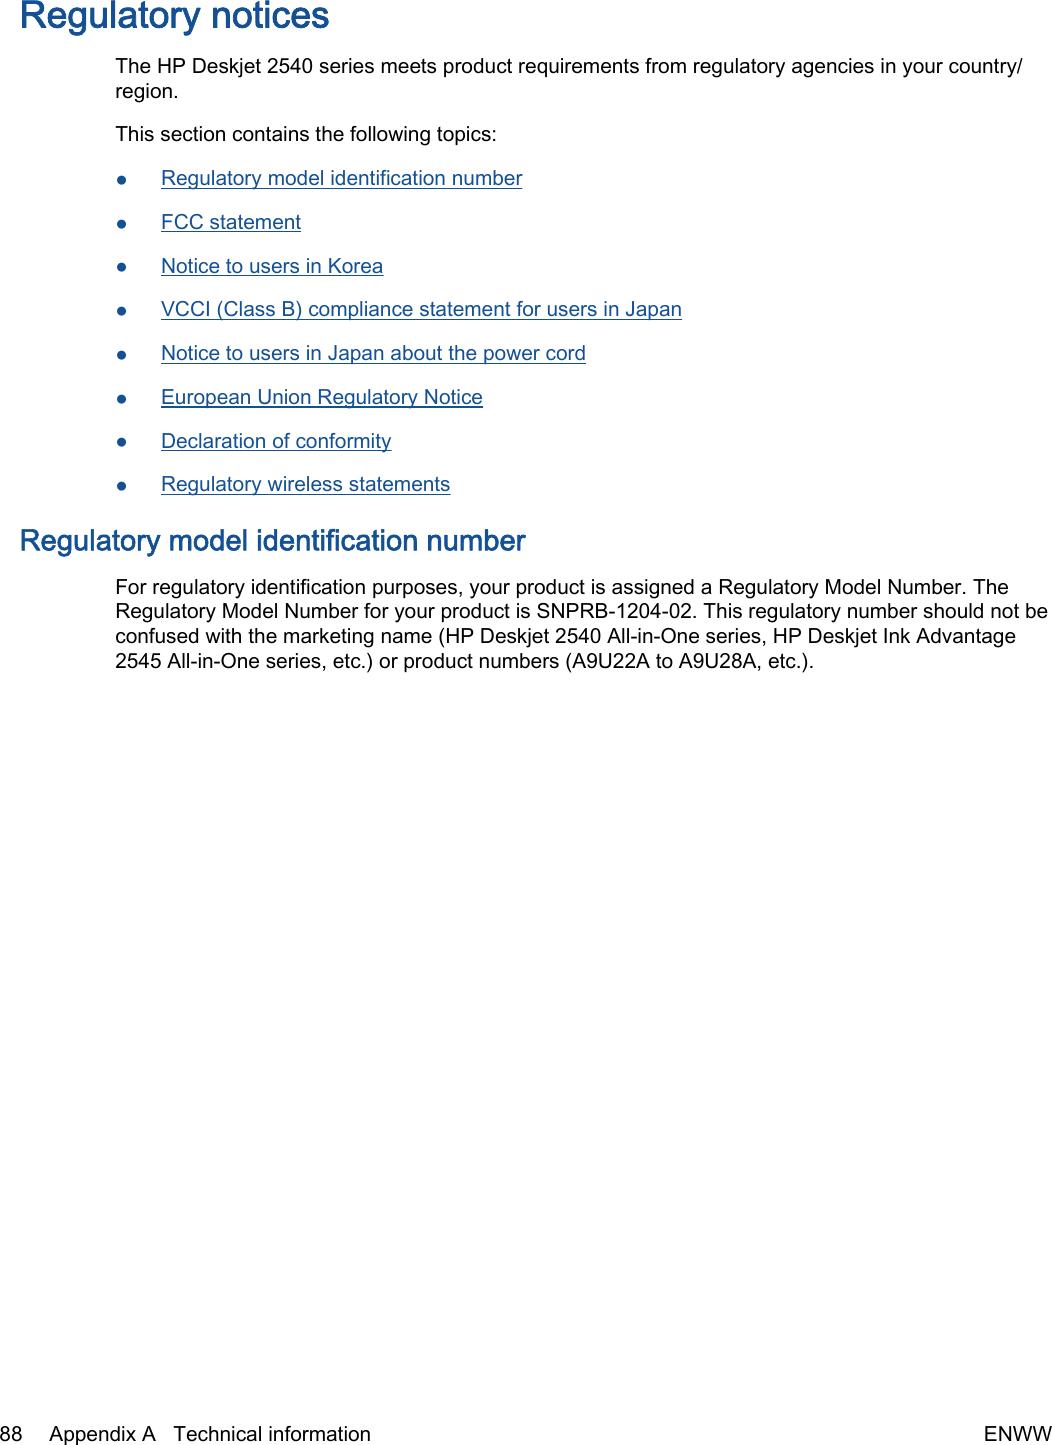 Install Hp Deskjet 2540 Without Cd